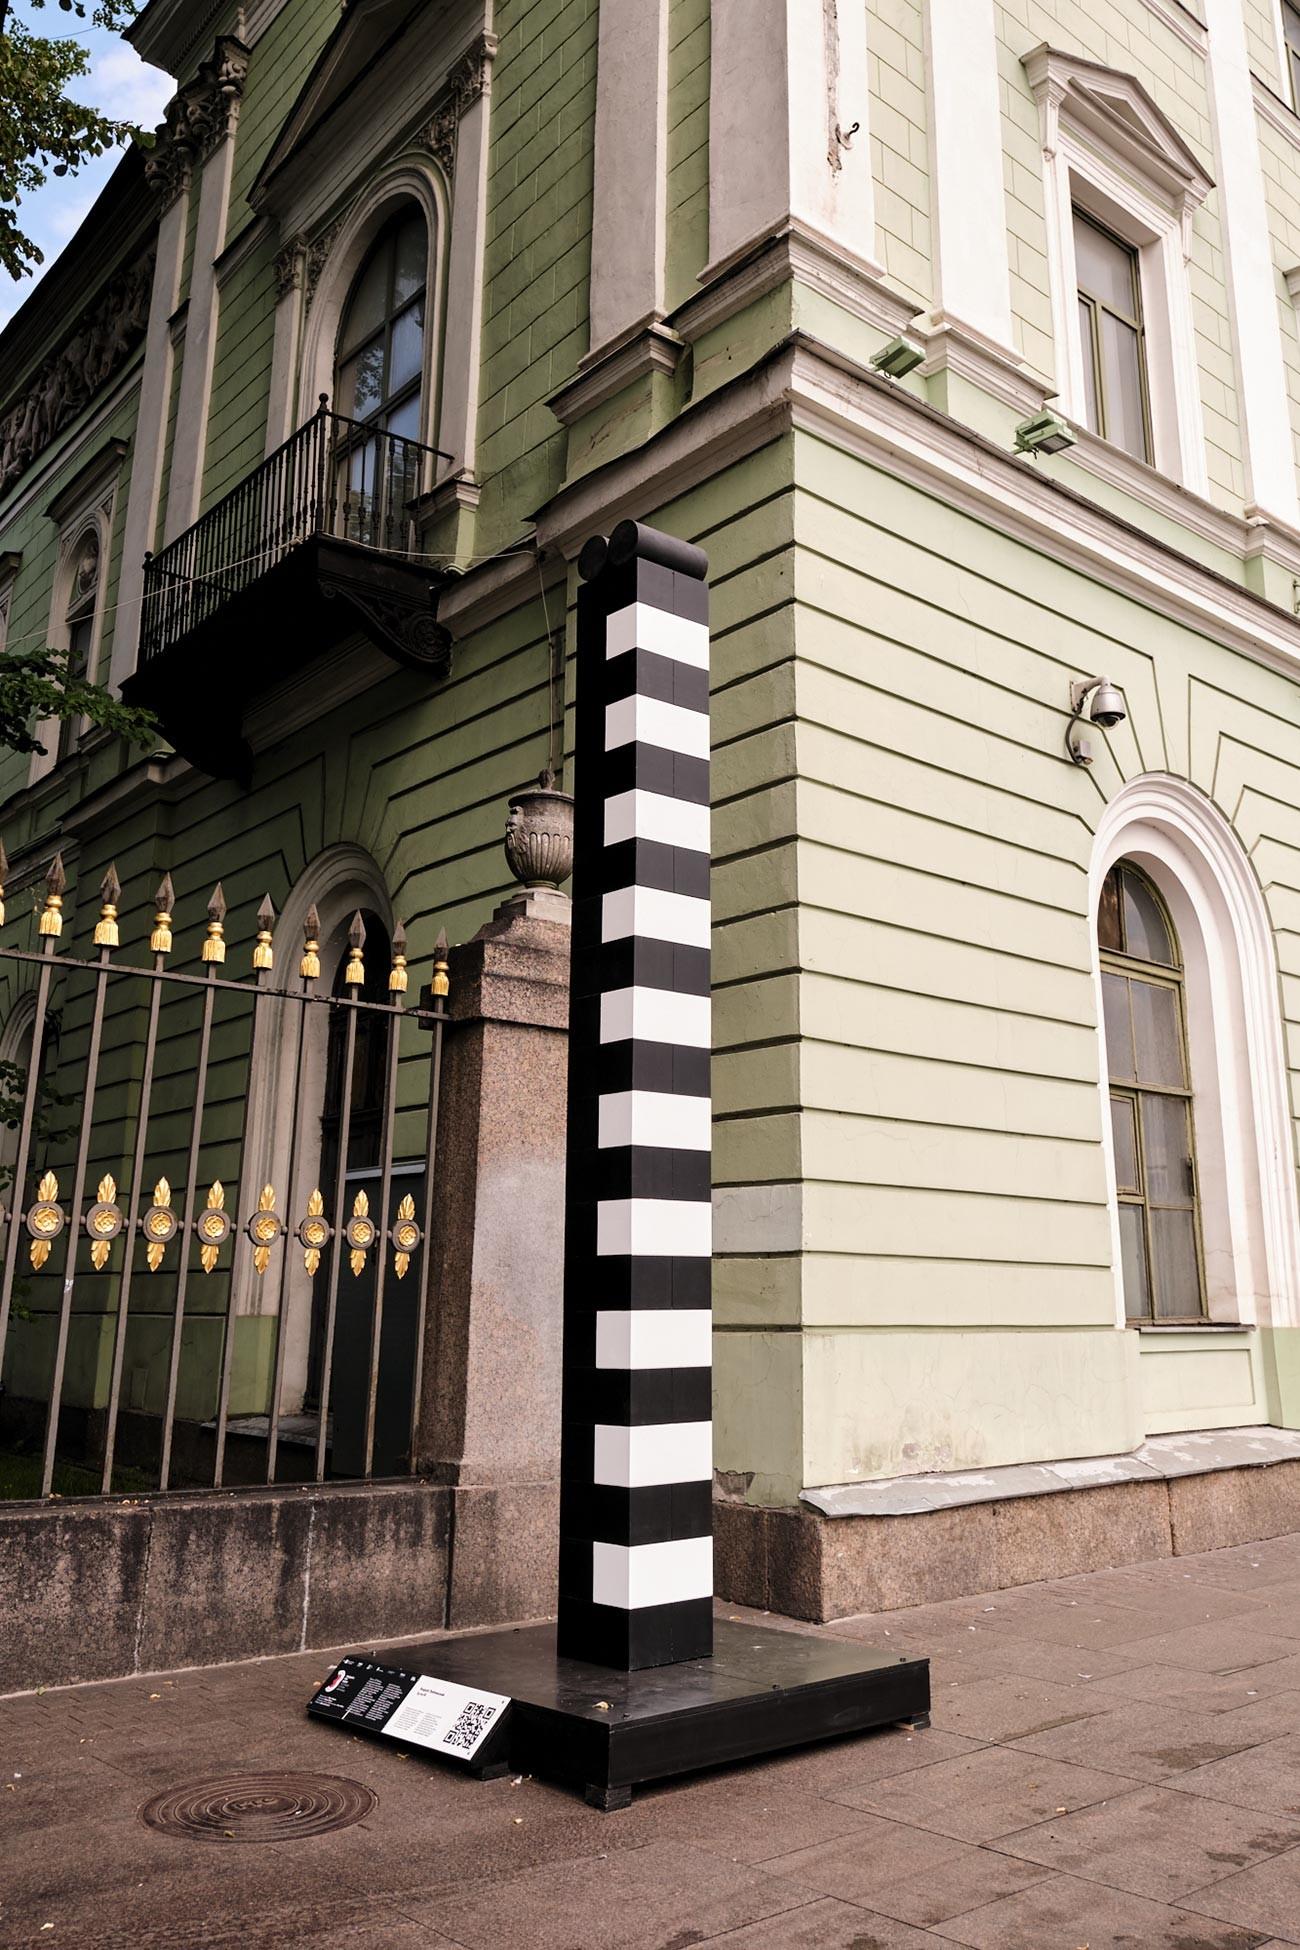 Andrei Lublinsky's